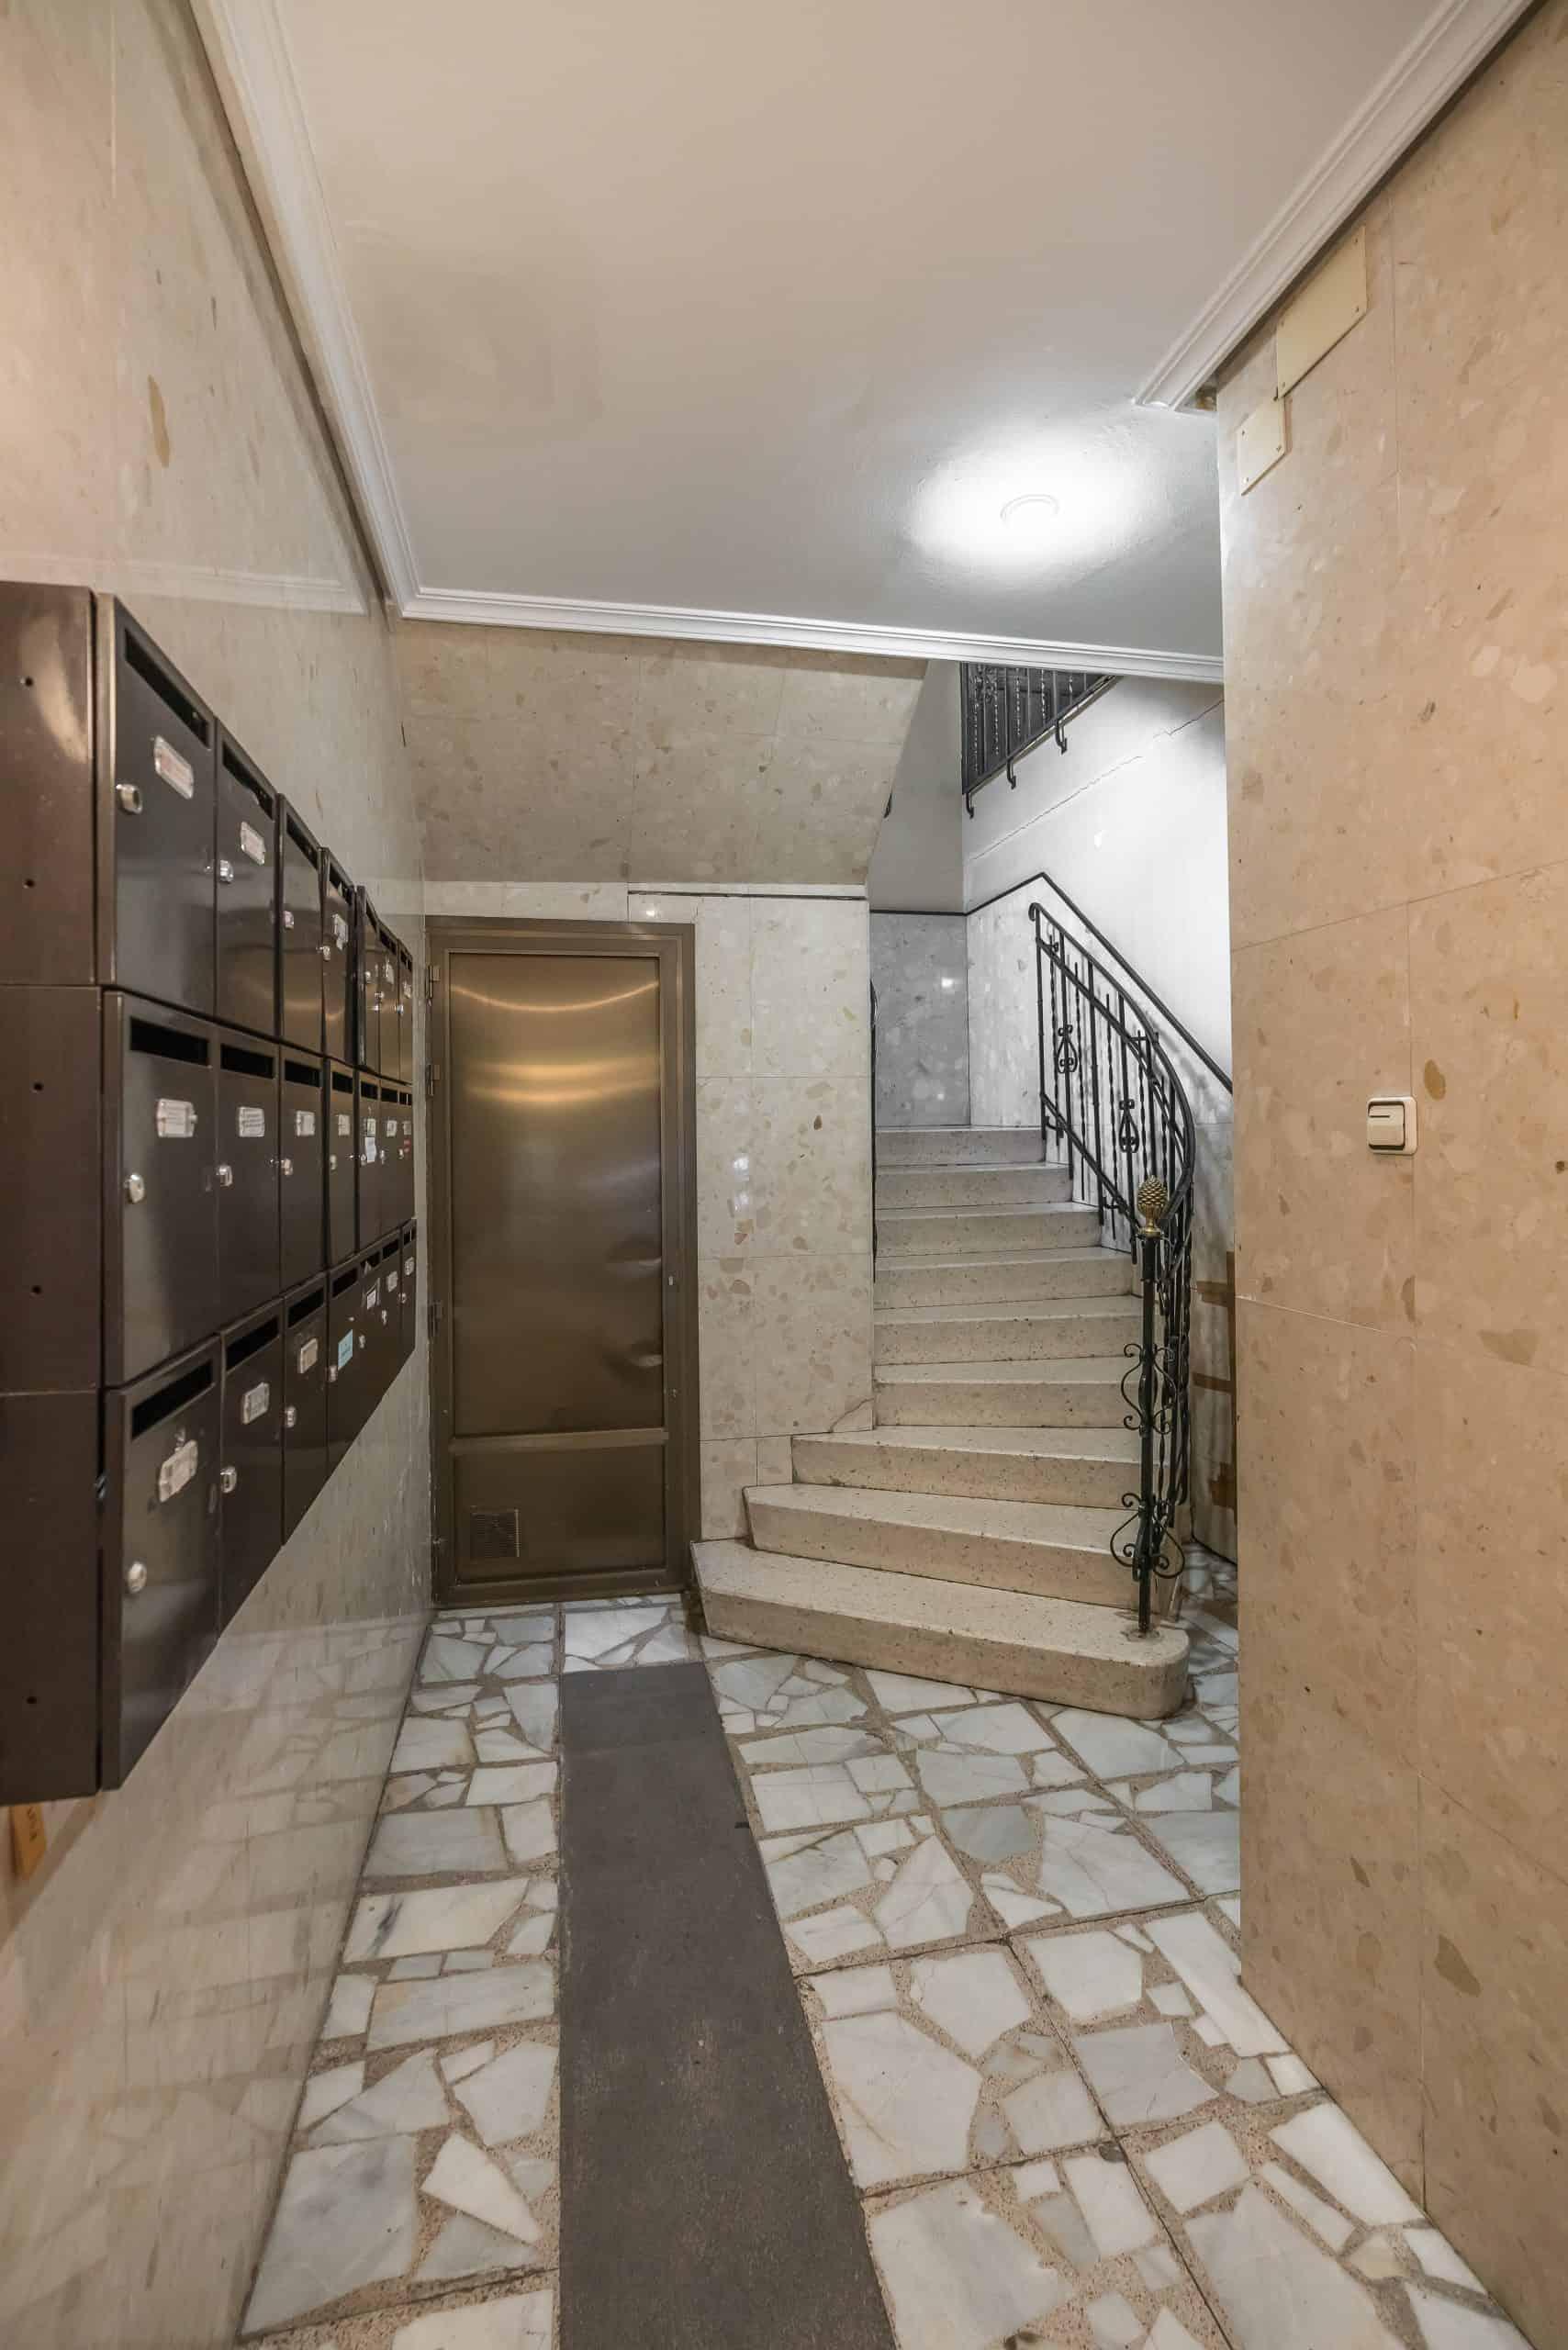 Agencia Inmobiliaria de Madrid-FUTUROCASA-Zona ARGANZUELA-EMBAJADORES-LEGAZPI8 ZONAS COMUNES (4)